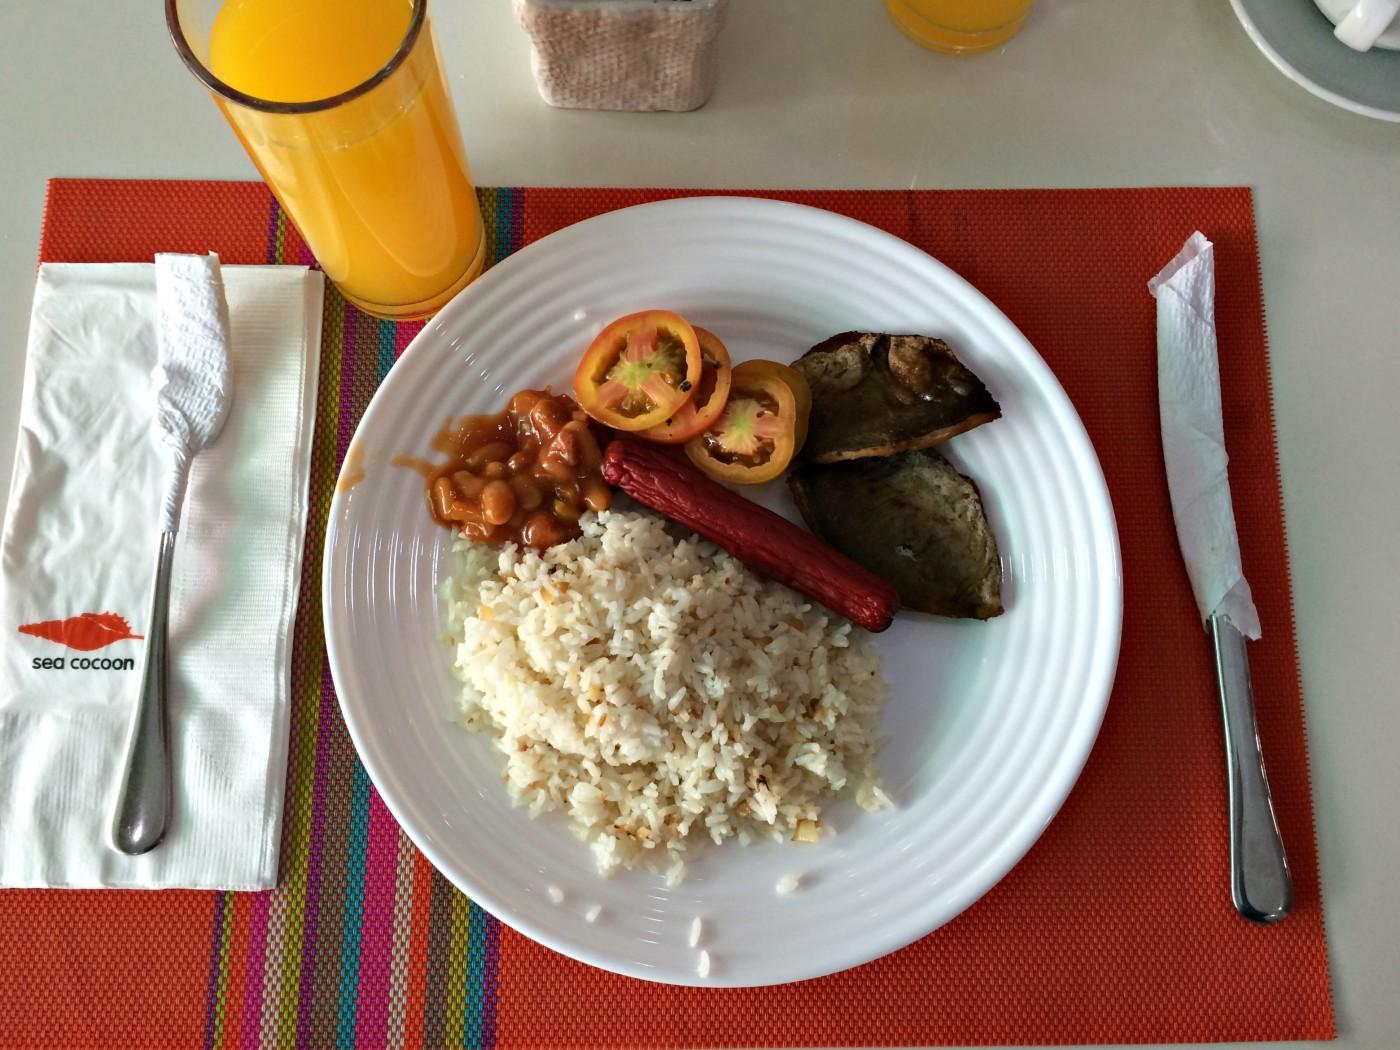 Sea Cocoon Hotel Breakfast